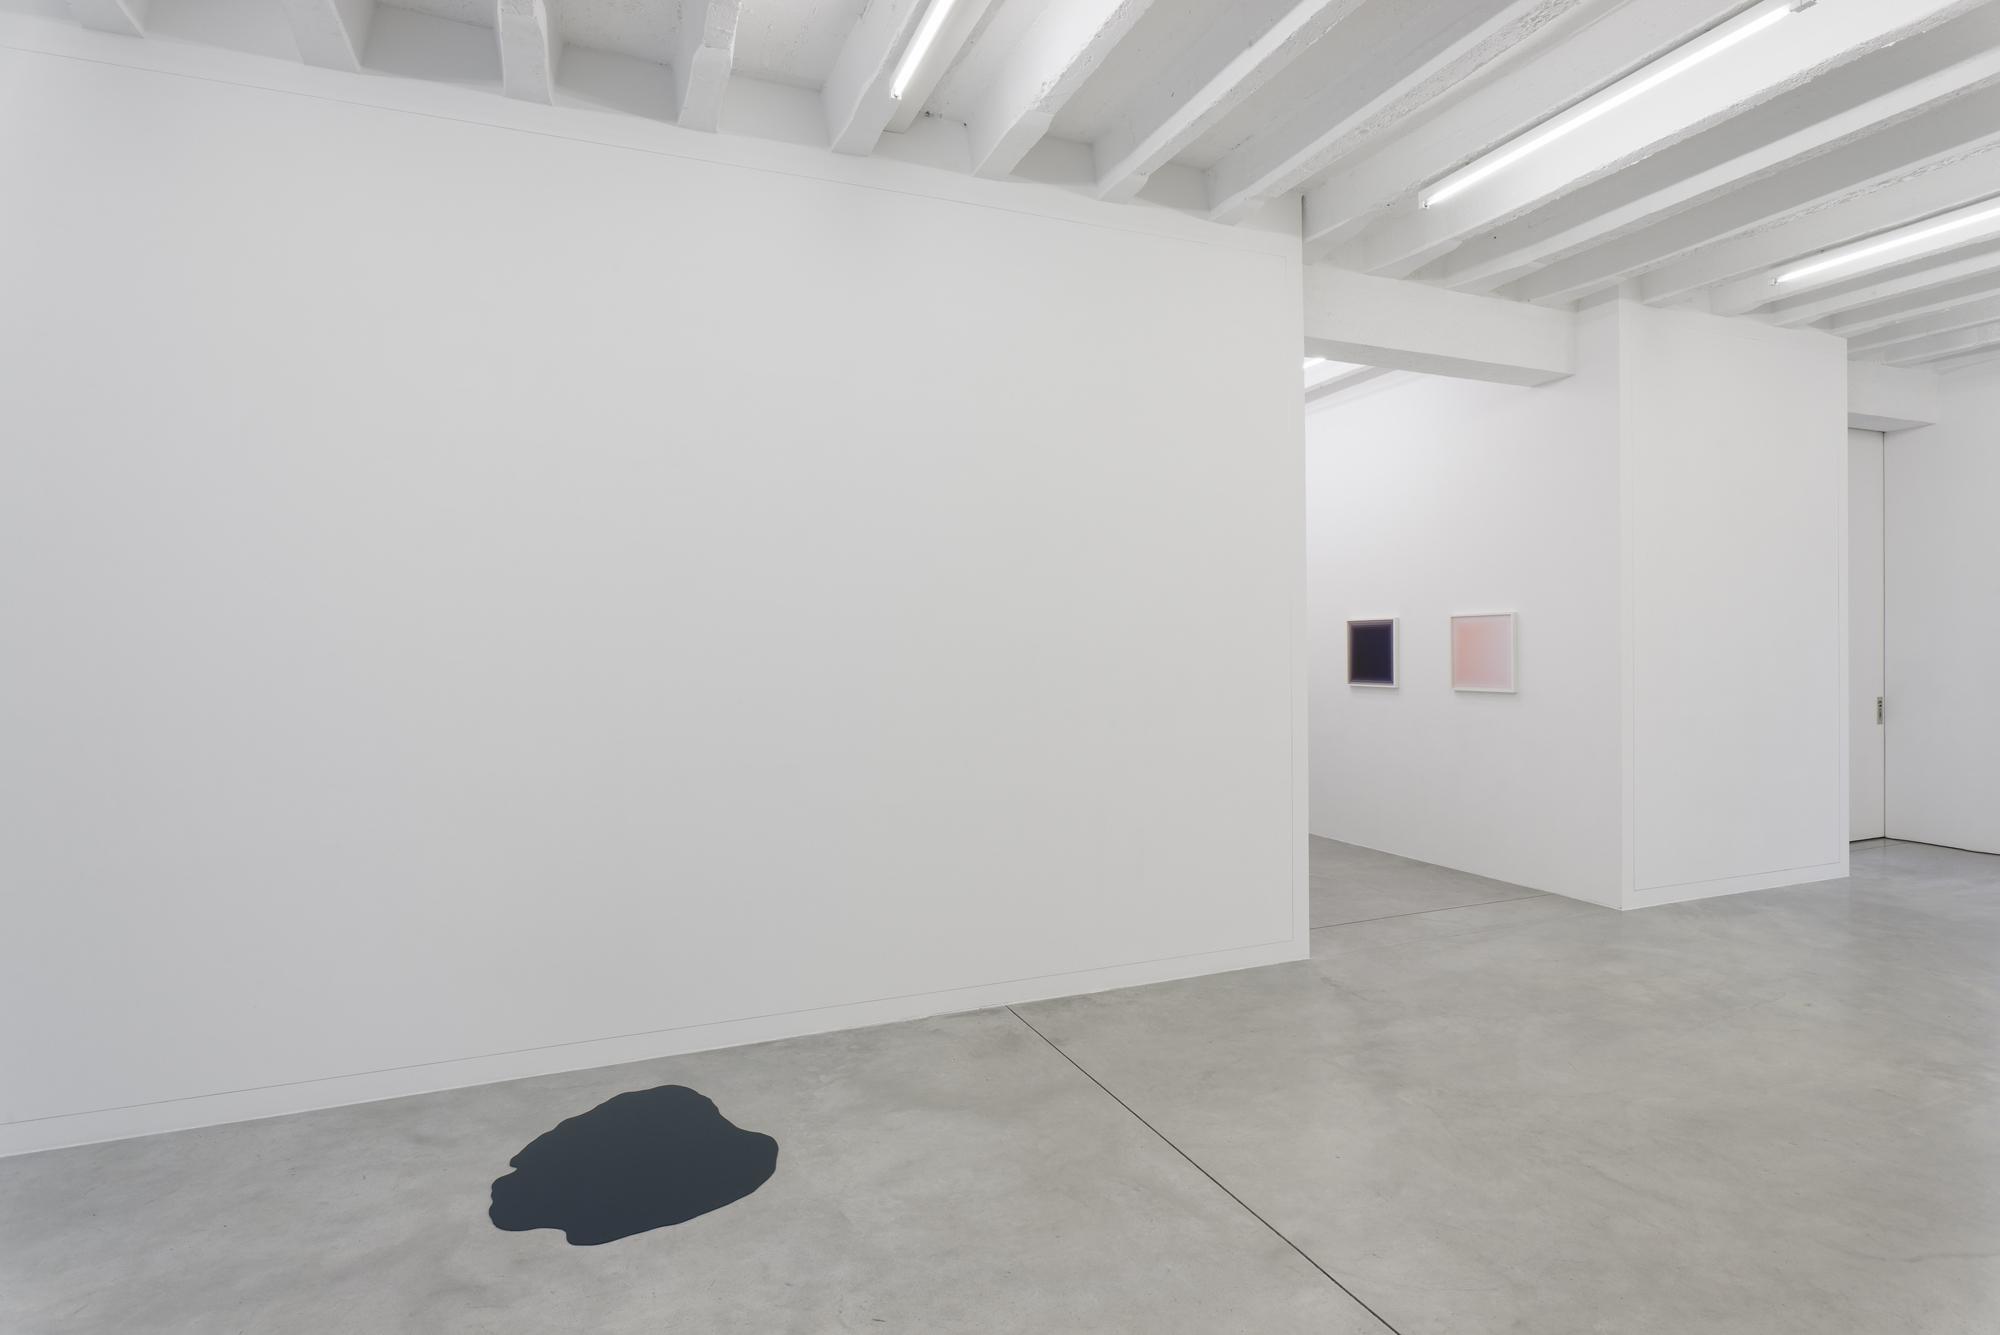 Alexander Gutke, Silver Lining, exhibition view, Galerija Gregor Podnar, Berlin, 2016. Photo: Marcus Schneider